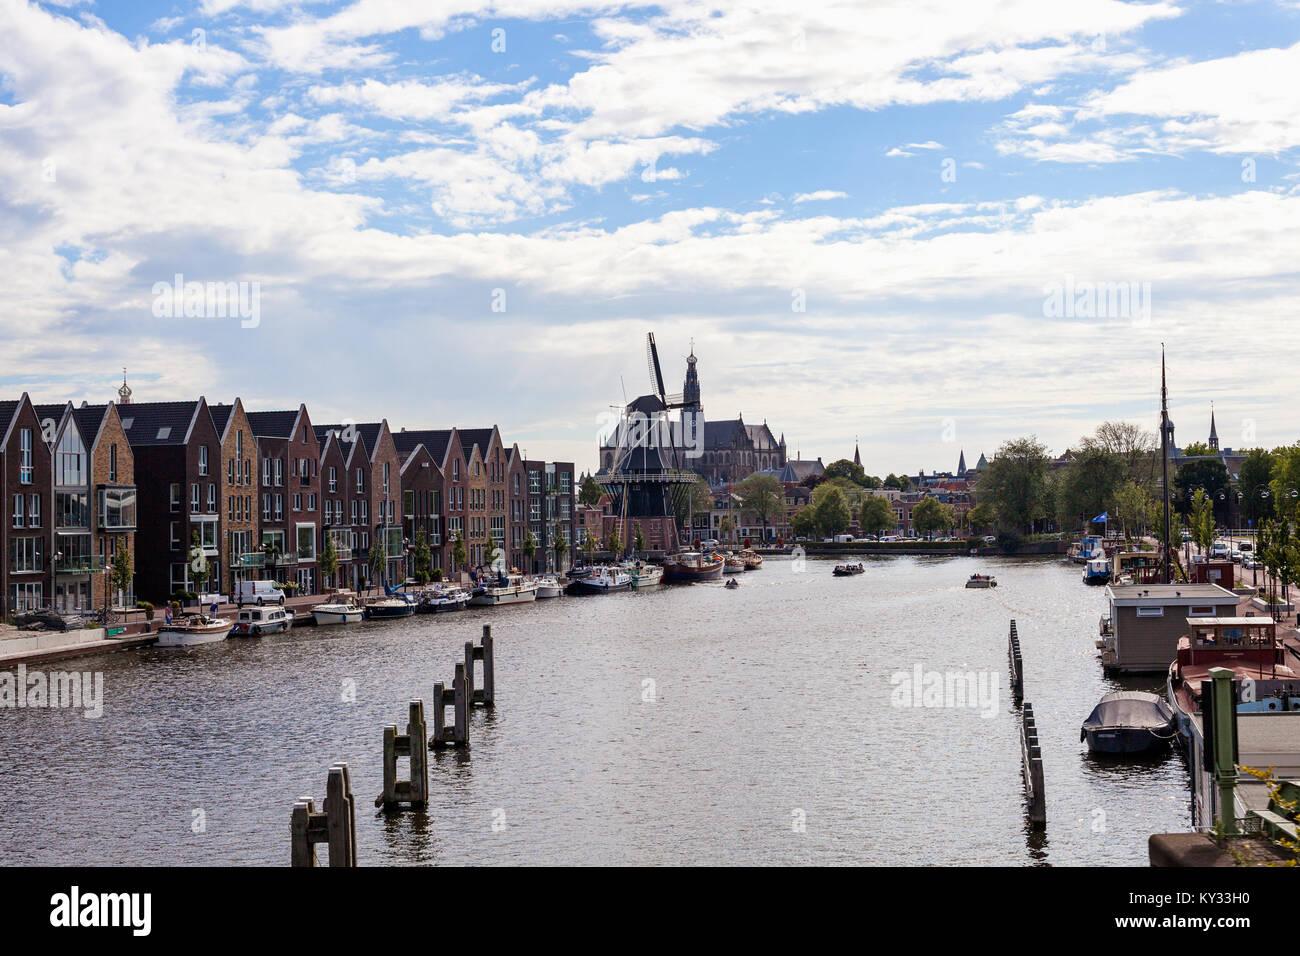 Haarlem, Netherlands. De Adriaan, landmark windmill in the centre of Haarlem on the Spaarne river - Stock Image